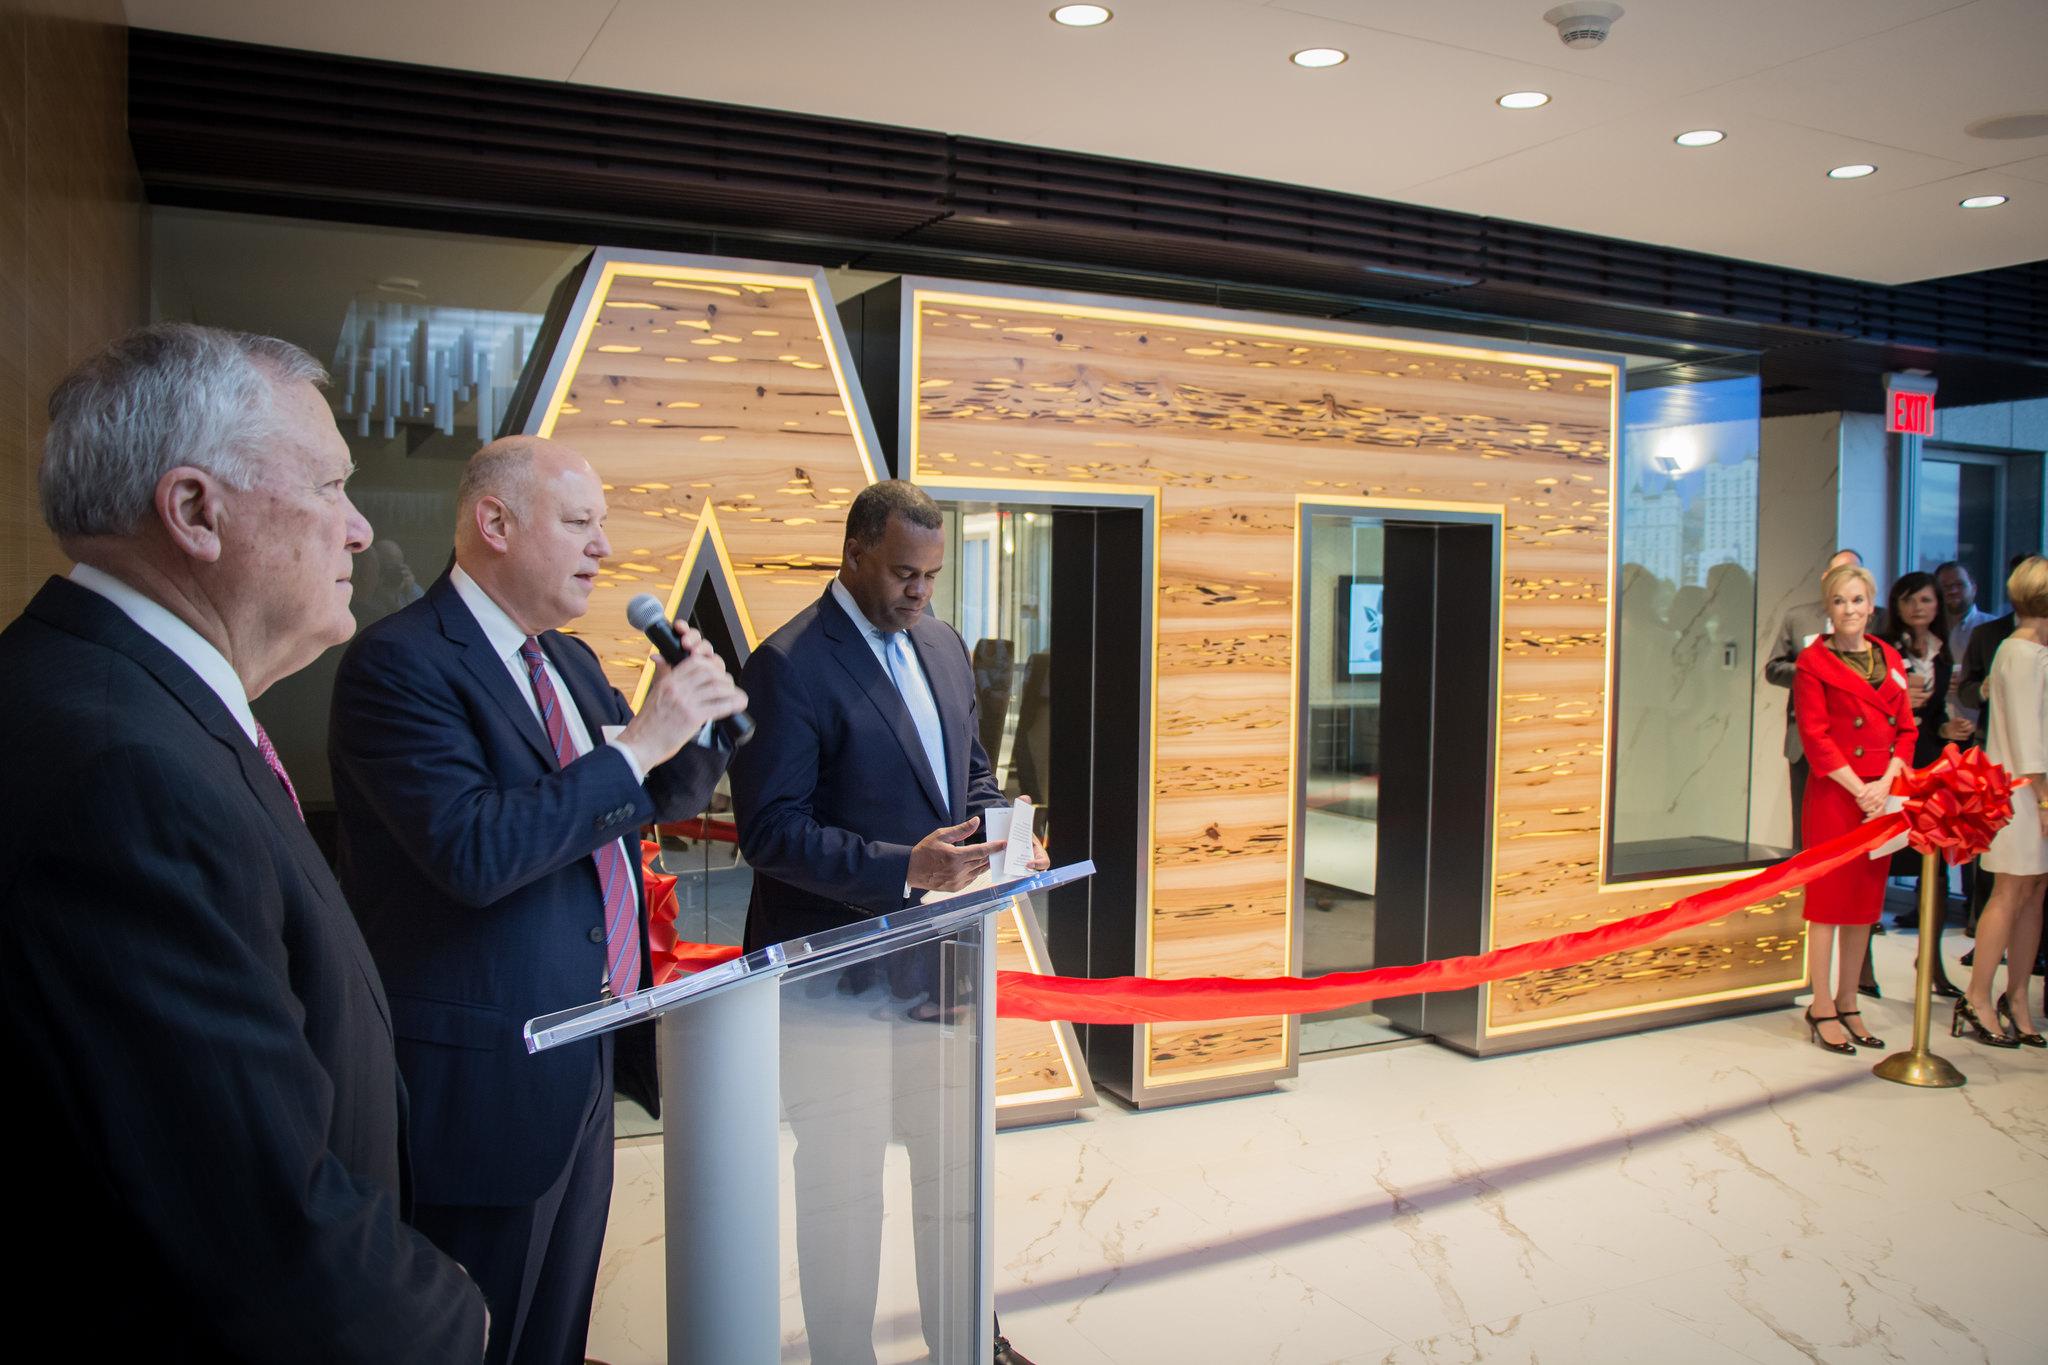 Georgia Gov. Nathan Deal and Atlanta Mayor Kasim Reed help christen the Metro Atlanta Chamber's new digs this morning.